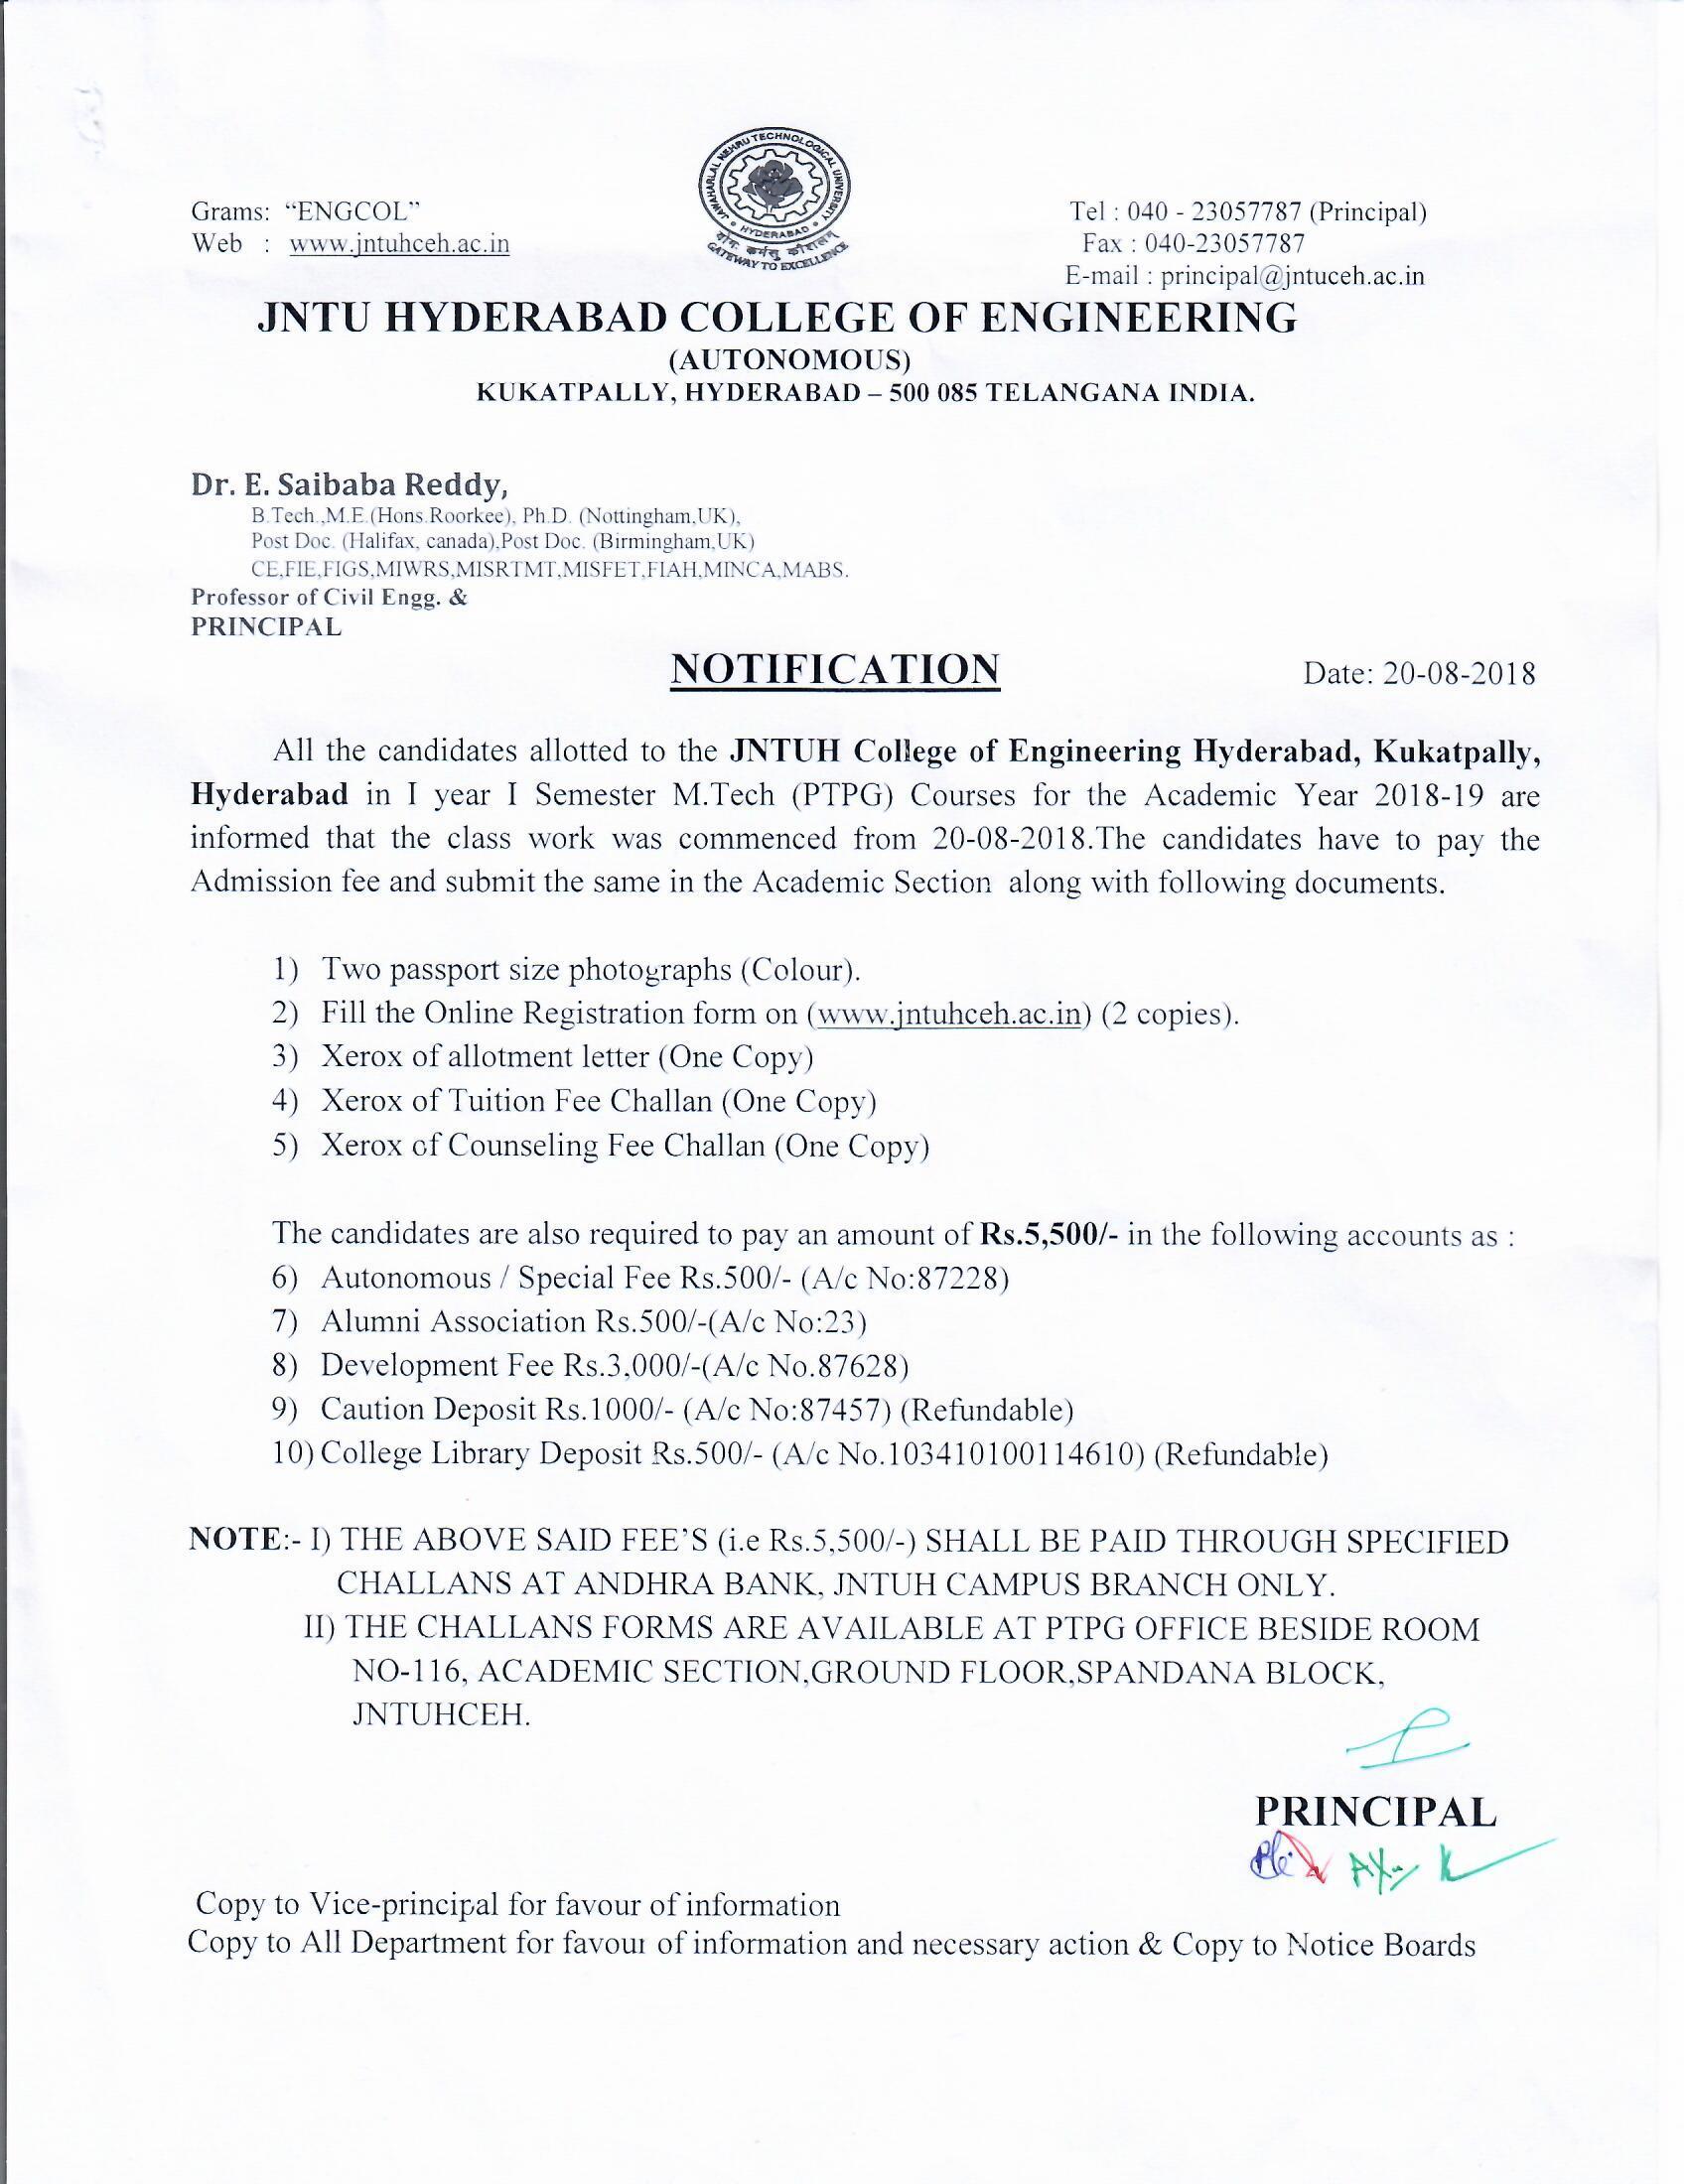 JNTUH College of Engineering Hyderabad (Autonomous)